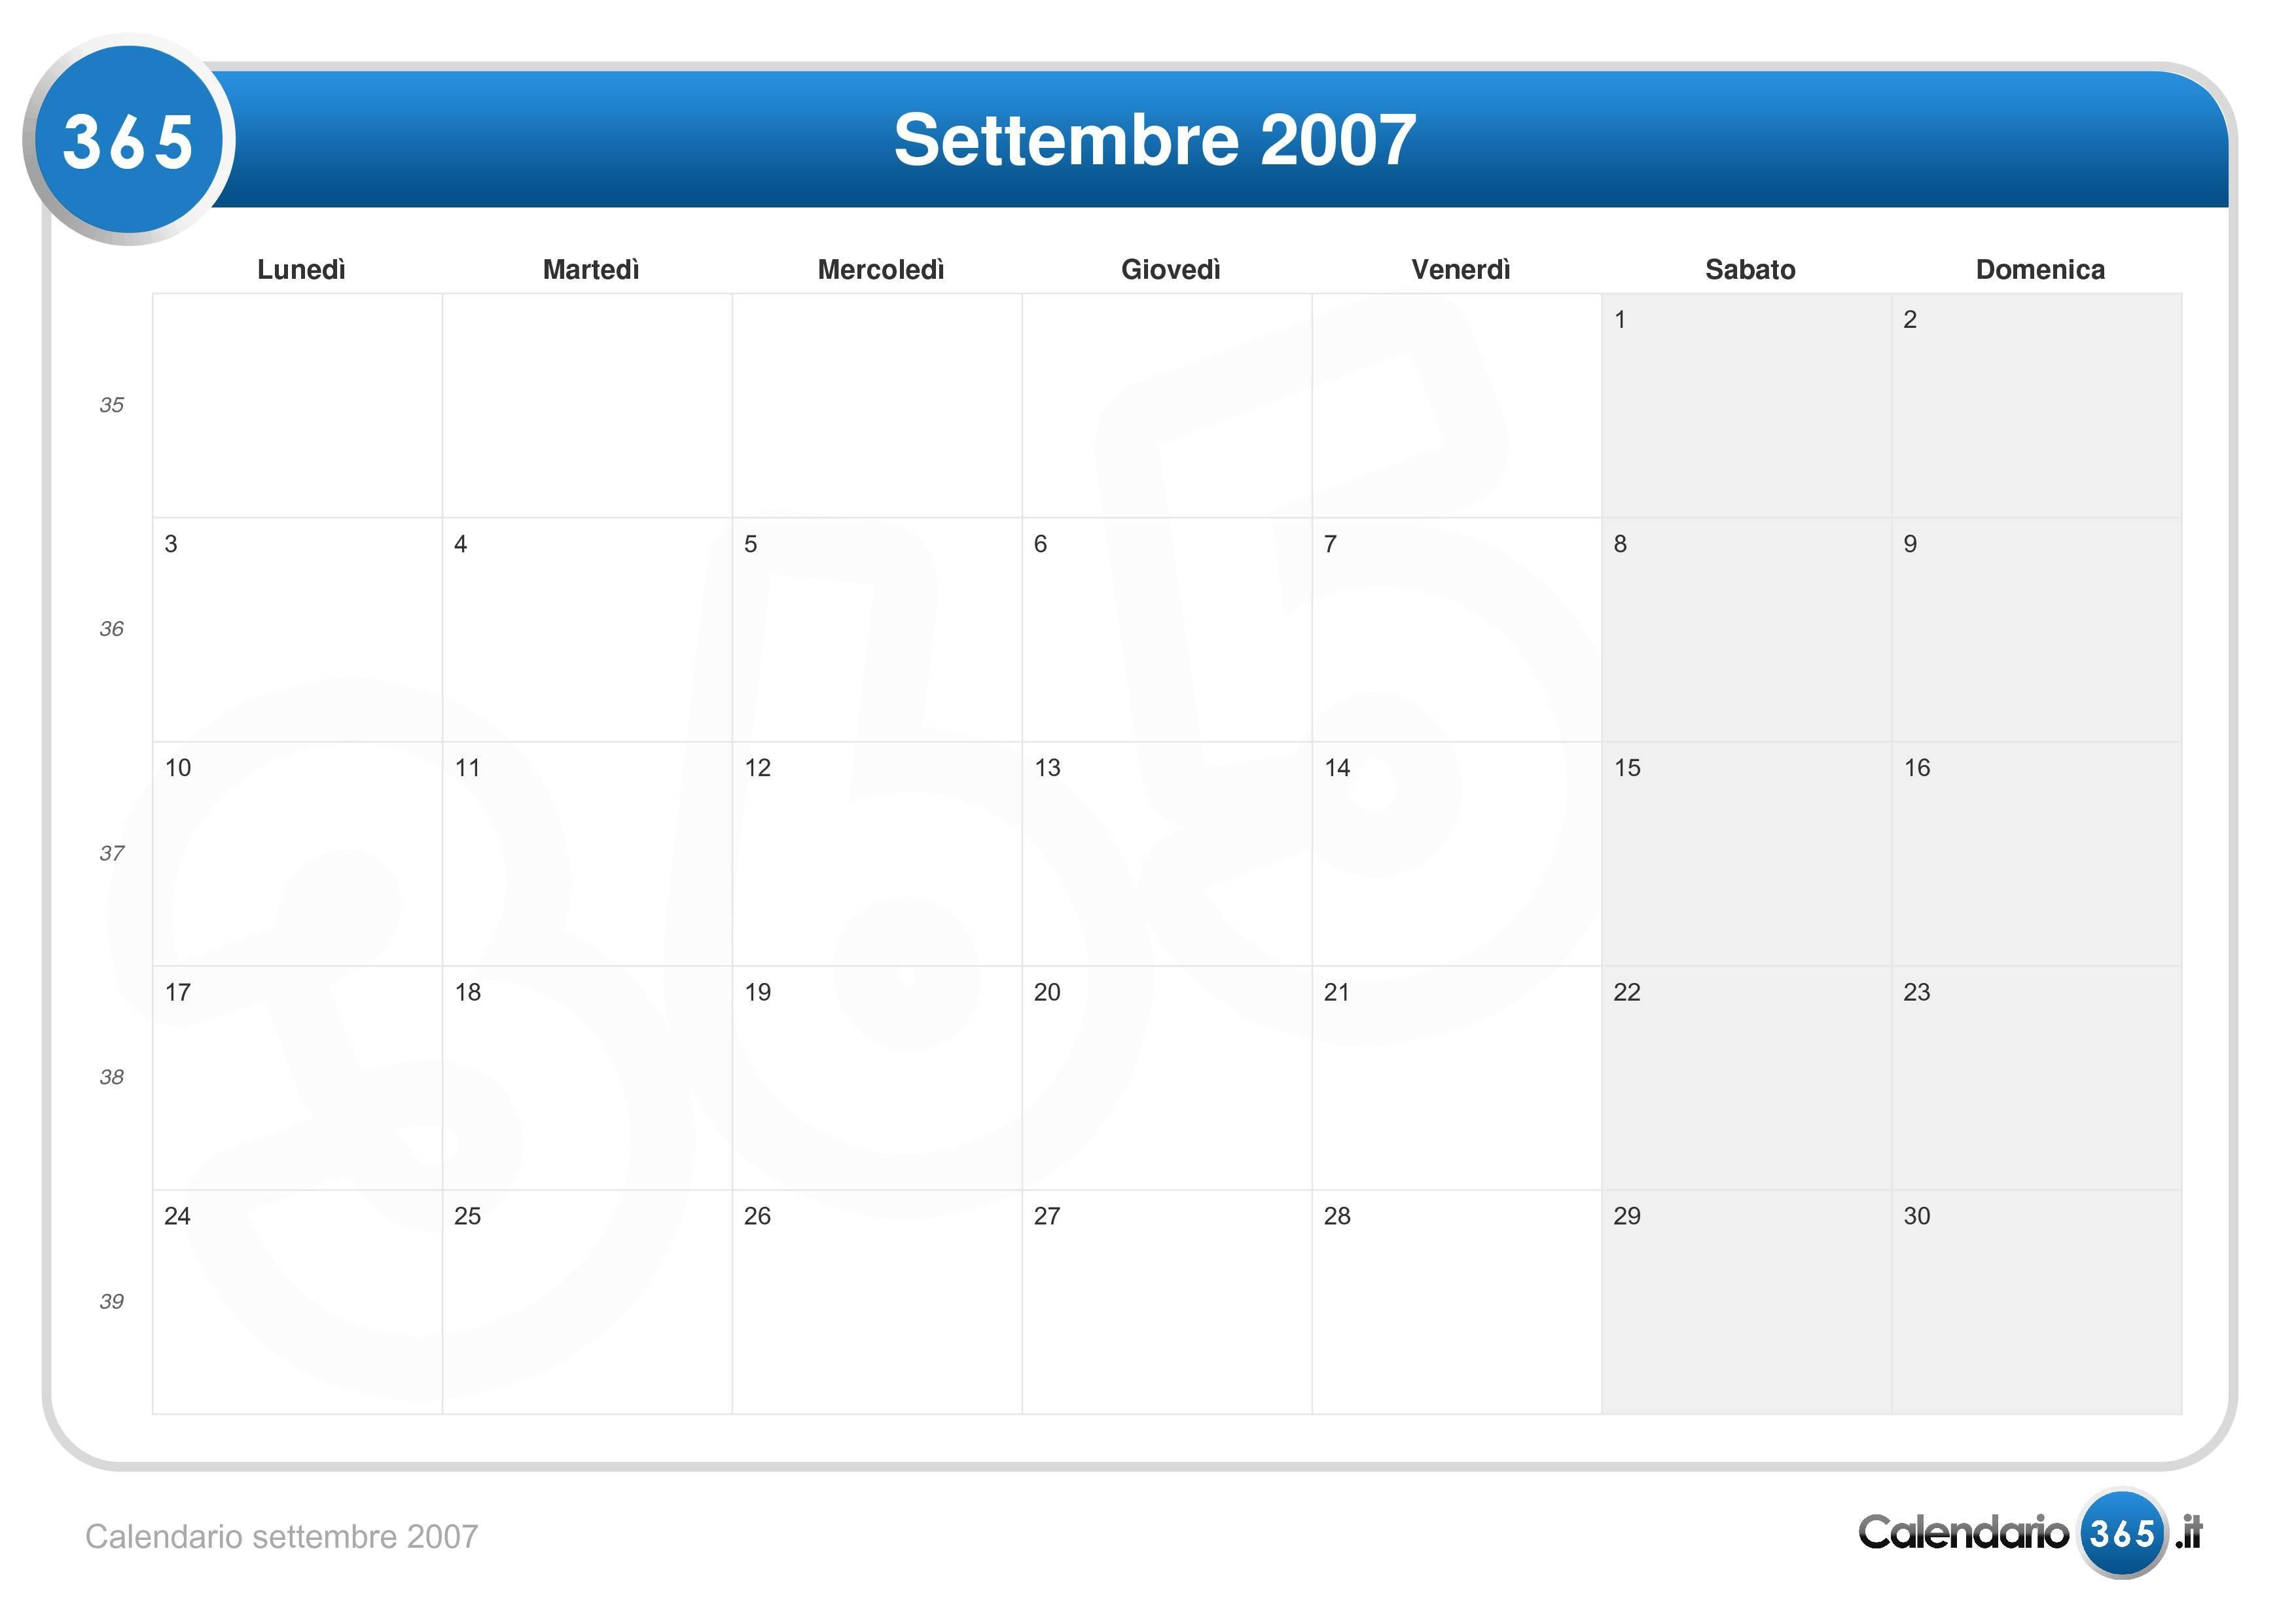 Calendario Settembre 2007.Calendario Settembre 2007